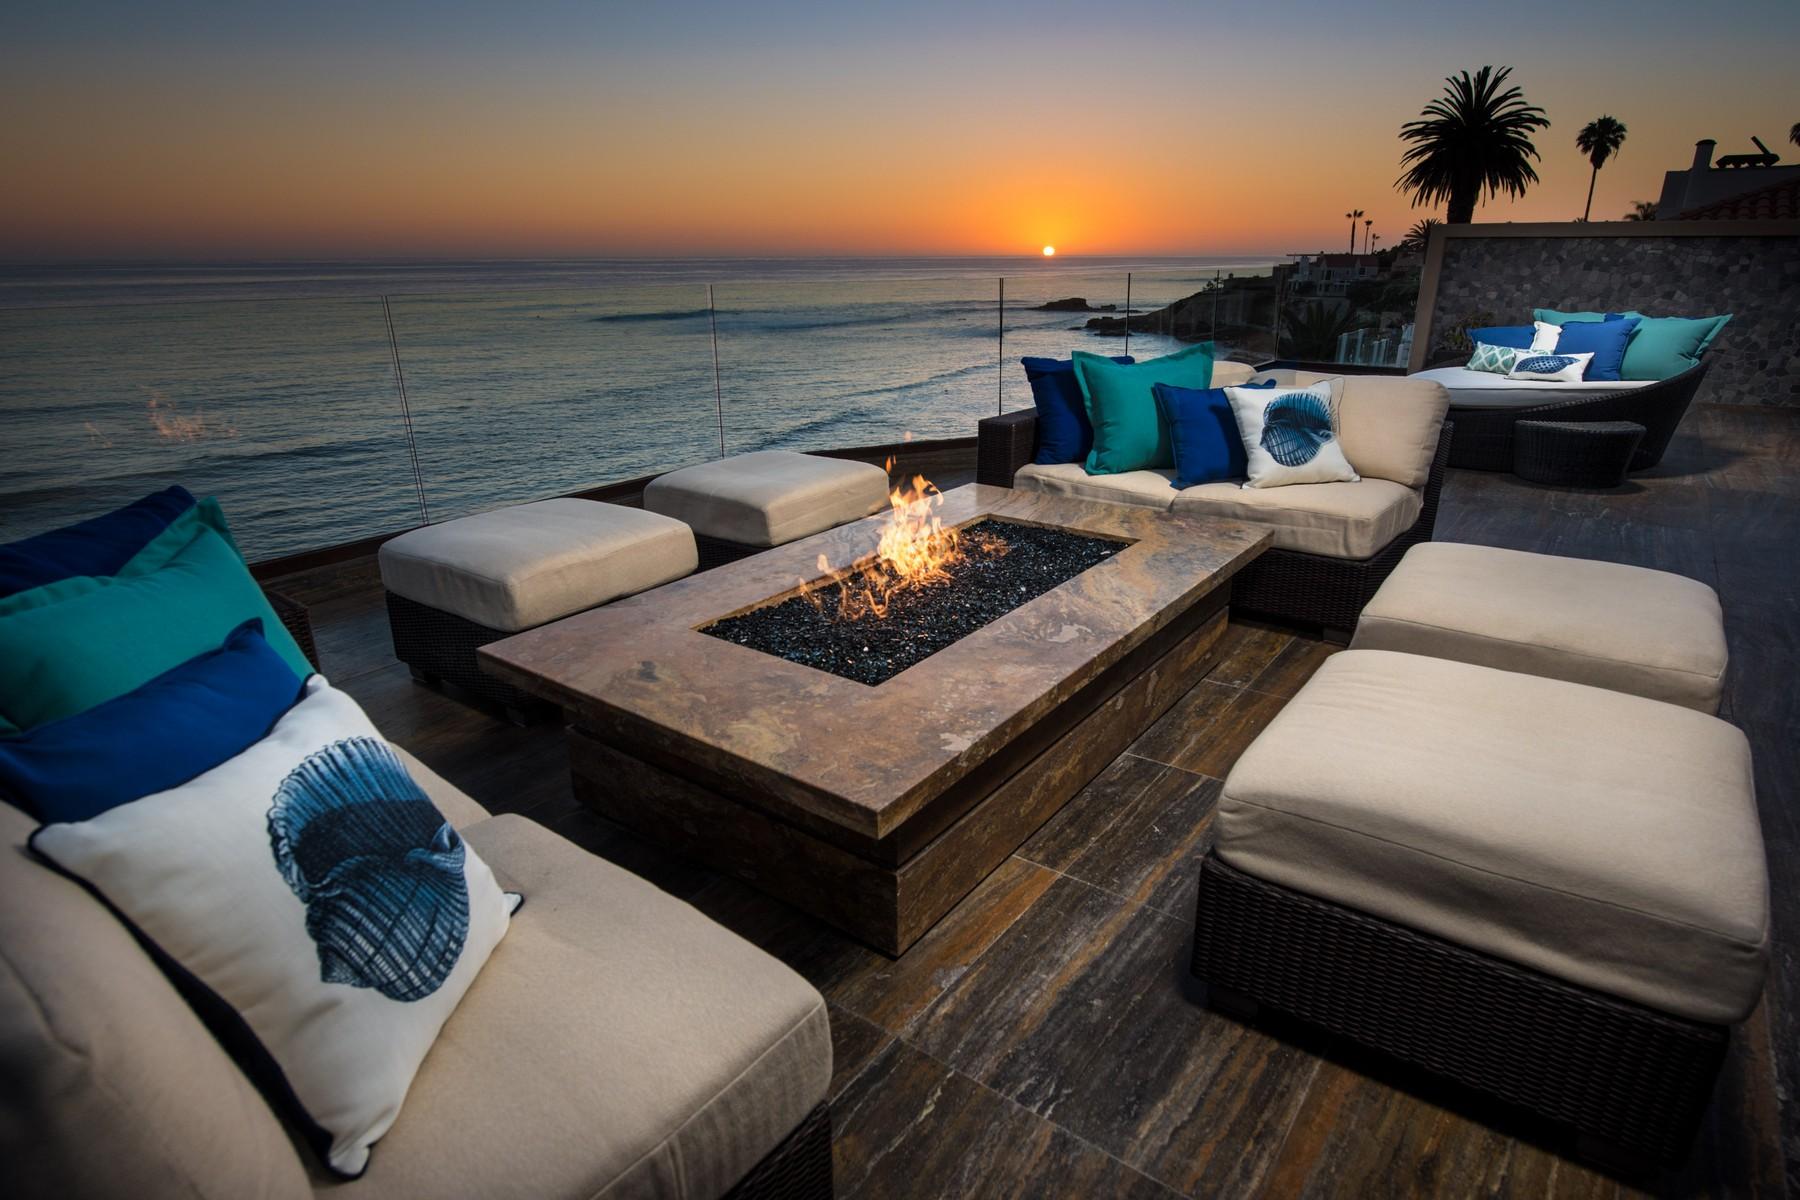 Single Family Home for Sale at 5564 Calumet Avenue La Jolla, California, 92037 United States